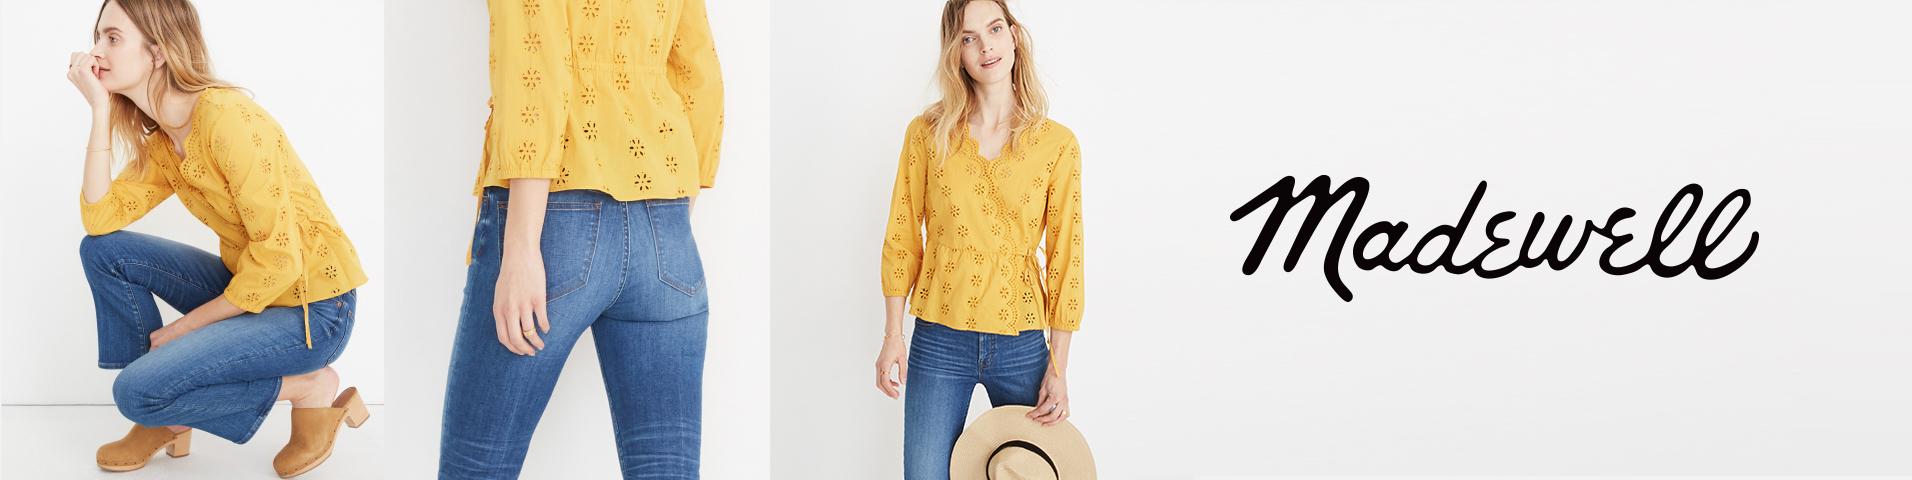 540e0f5e Madewell Damenmode bei ZALANDO | Die neusten Trends online shoppen